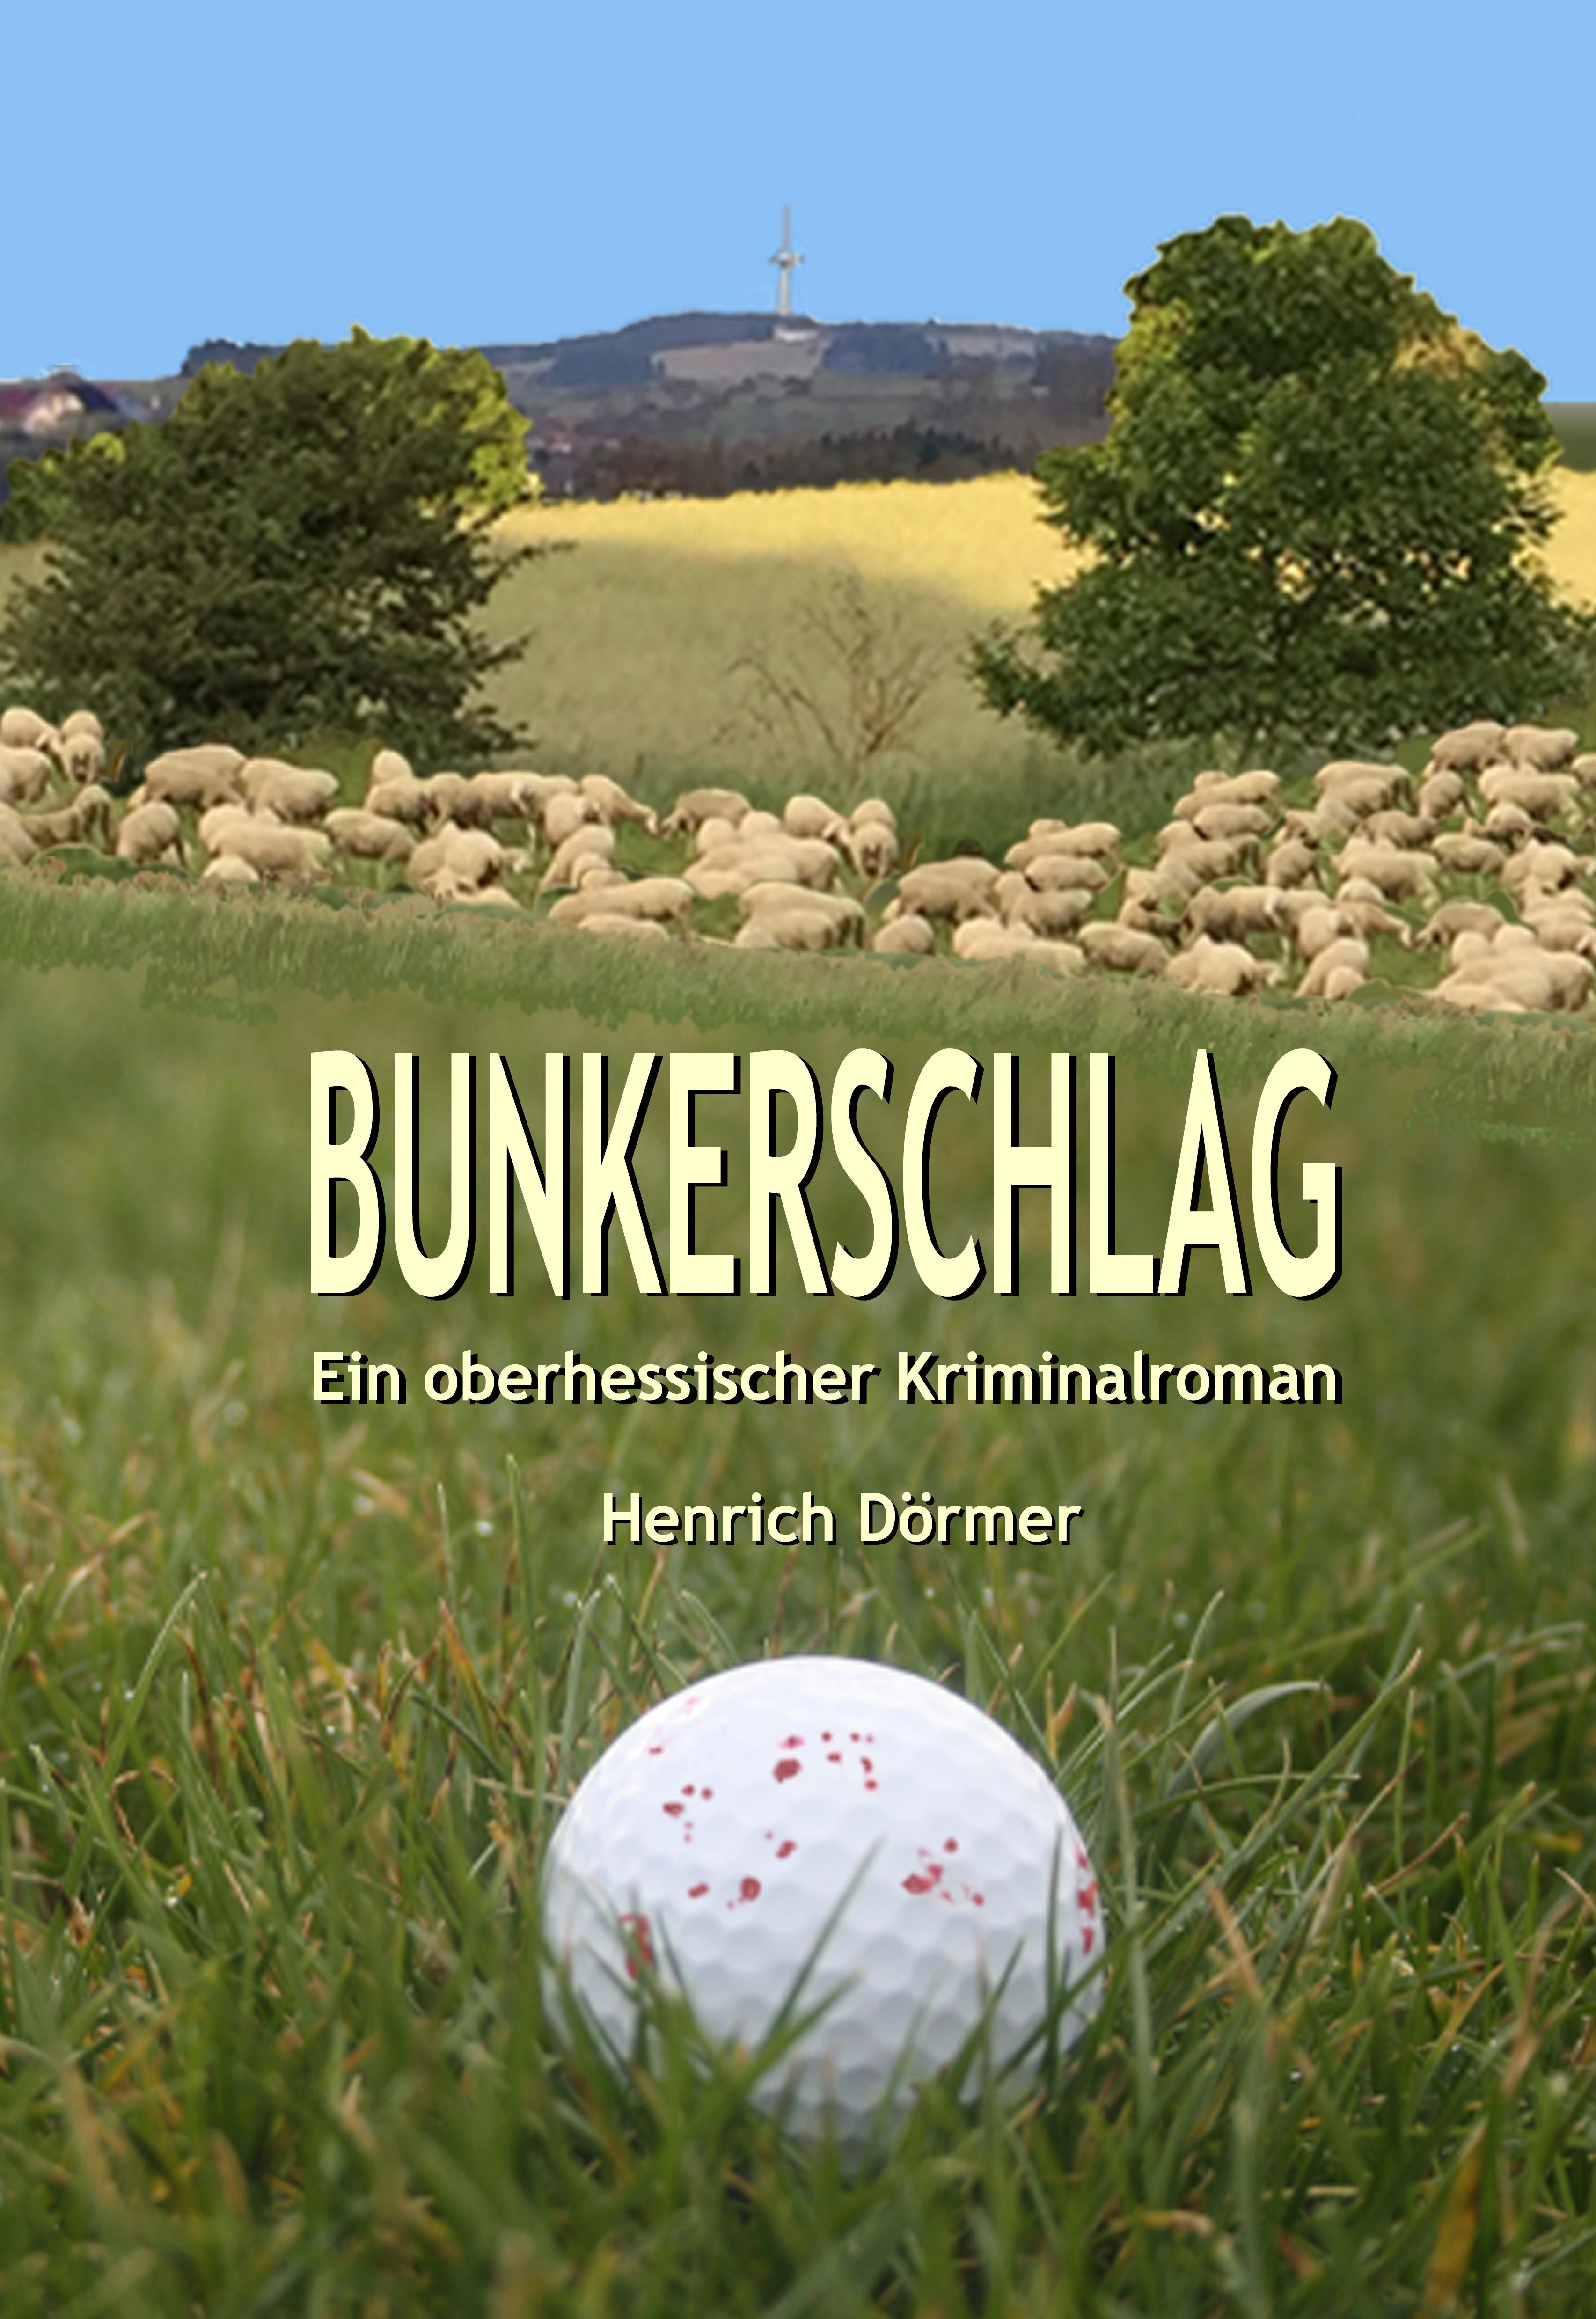 bunkerschlag3232mal2200mmpaperbackmitschattendina2coverseite